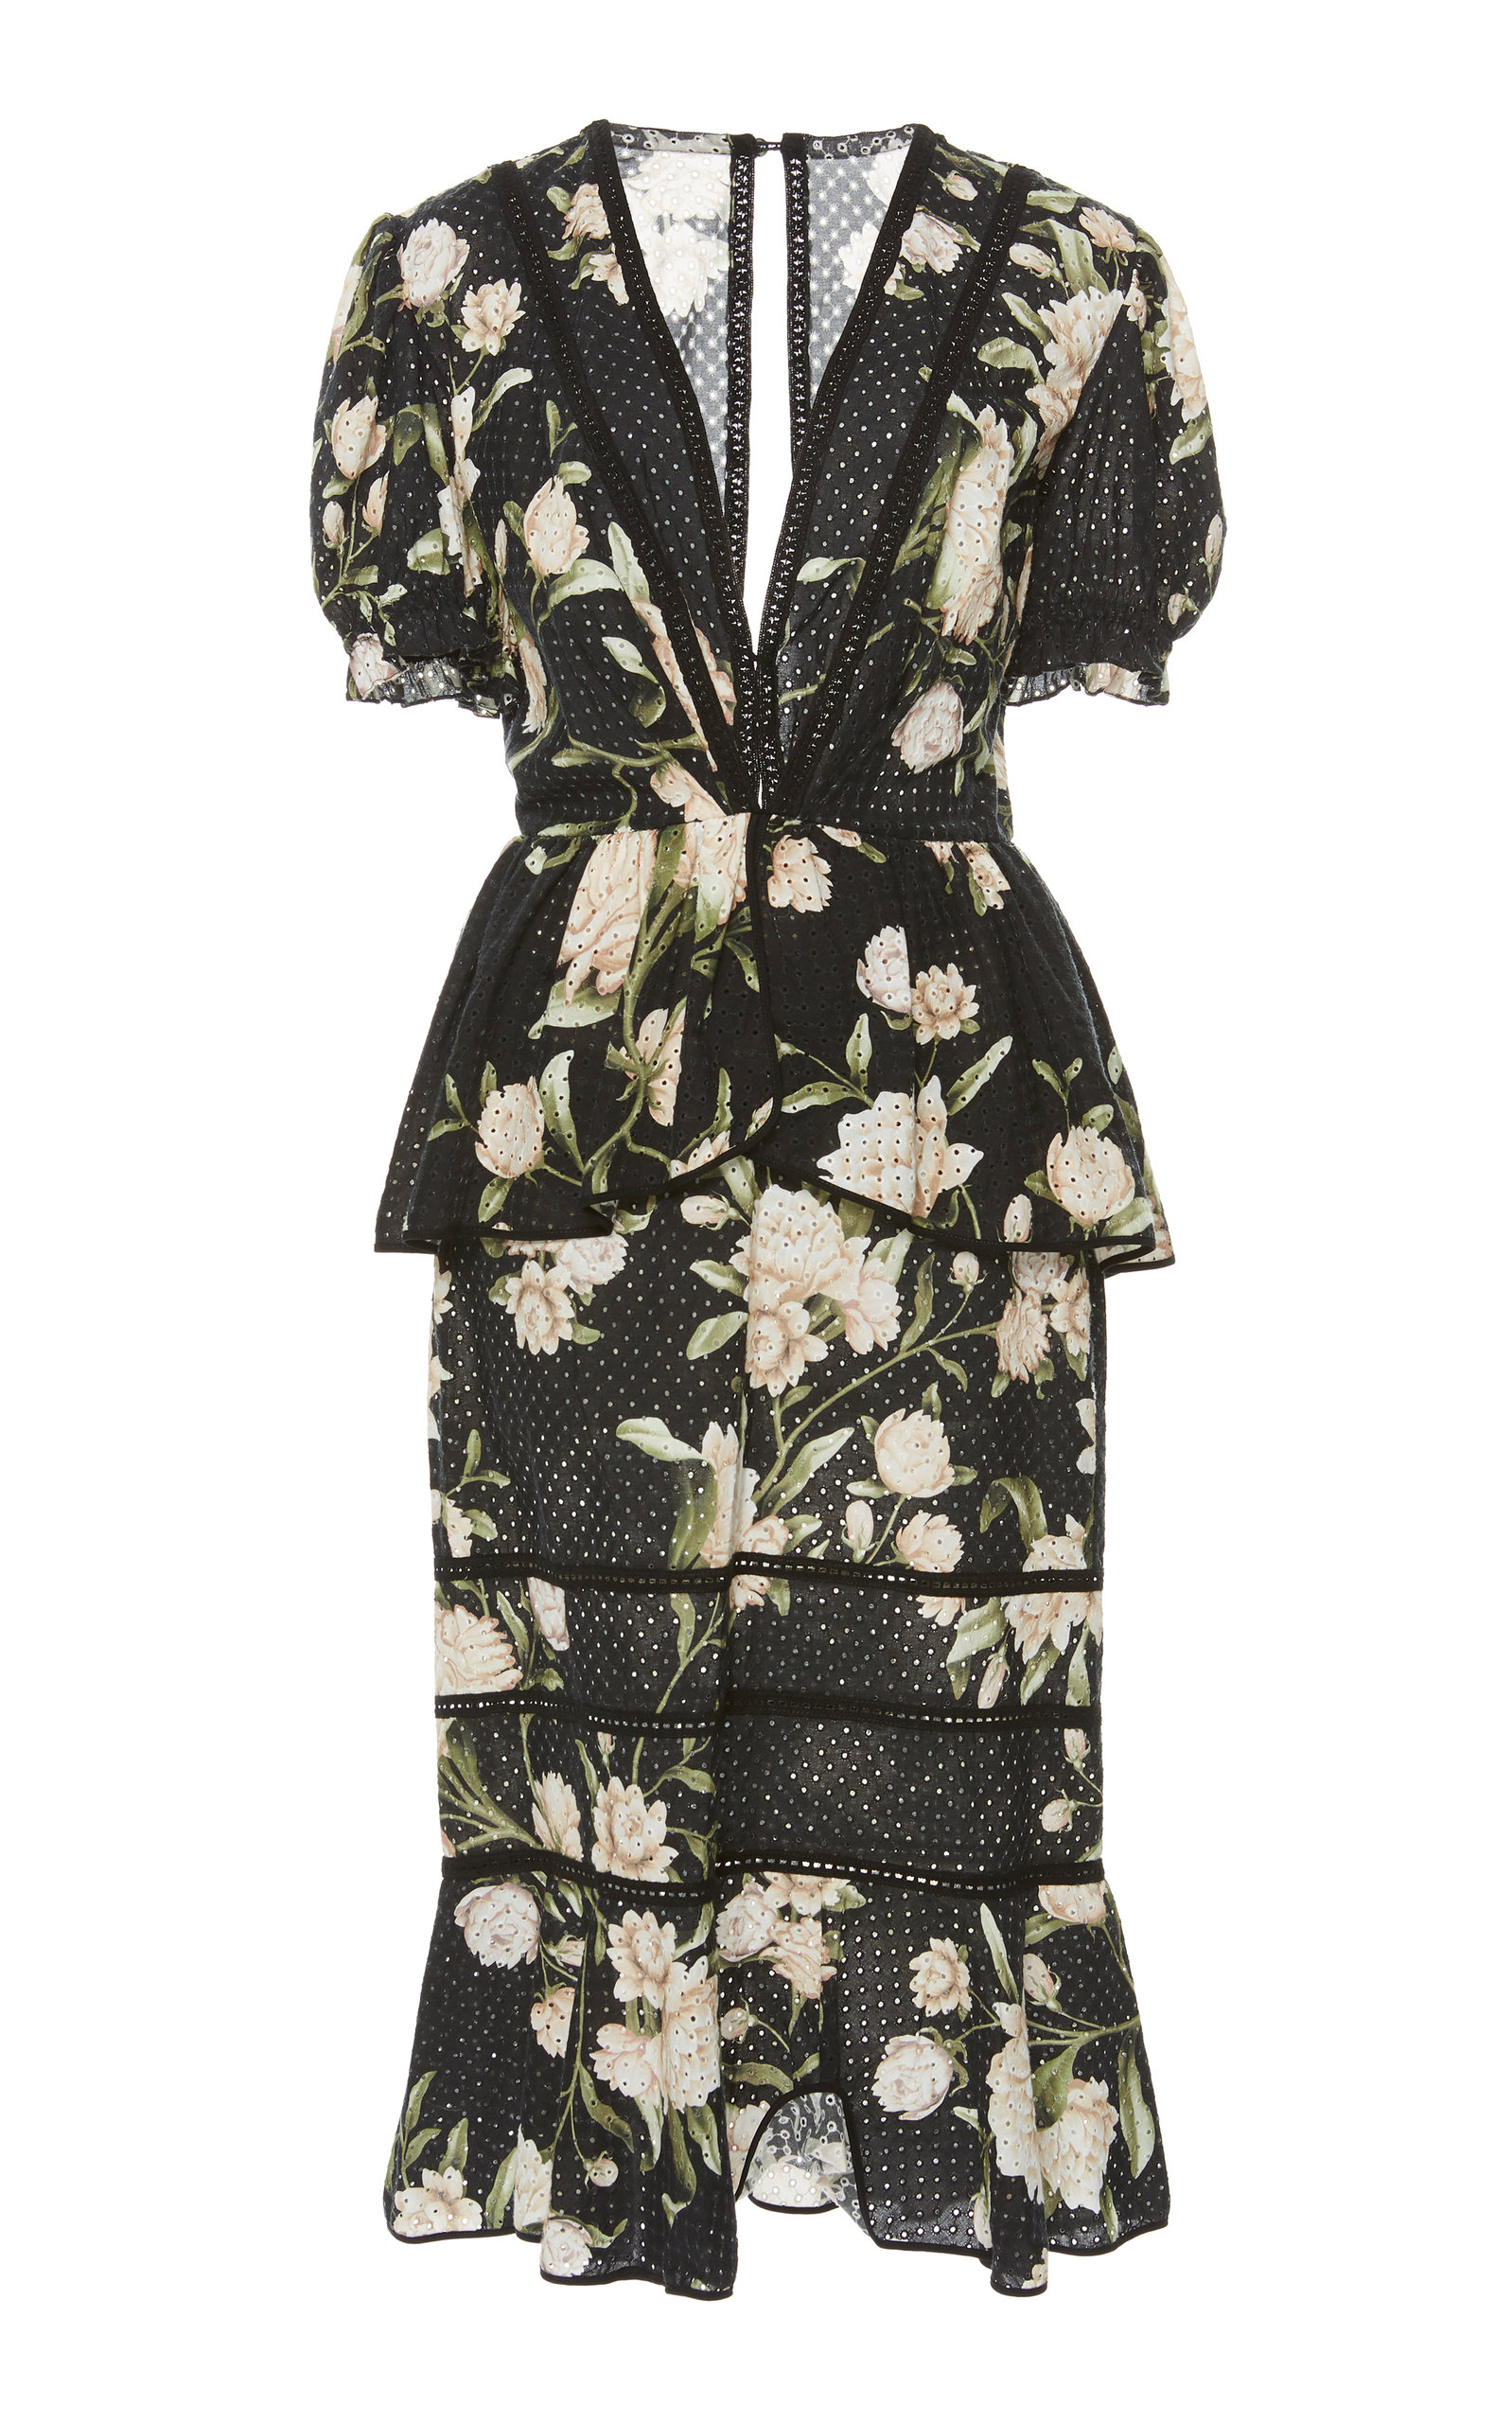 bda573ced22 Johanna OrtizOriental State Floral Cotton Eyelet Dress. CLOSE. Loading